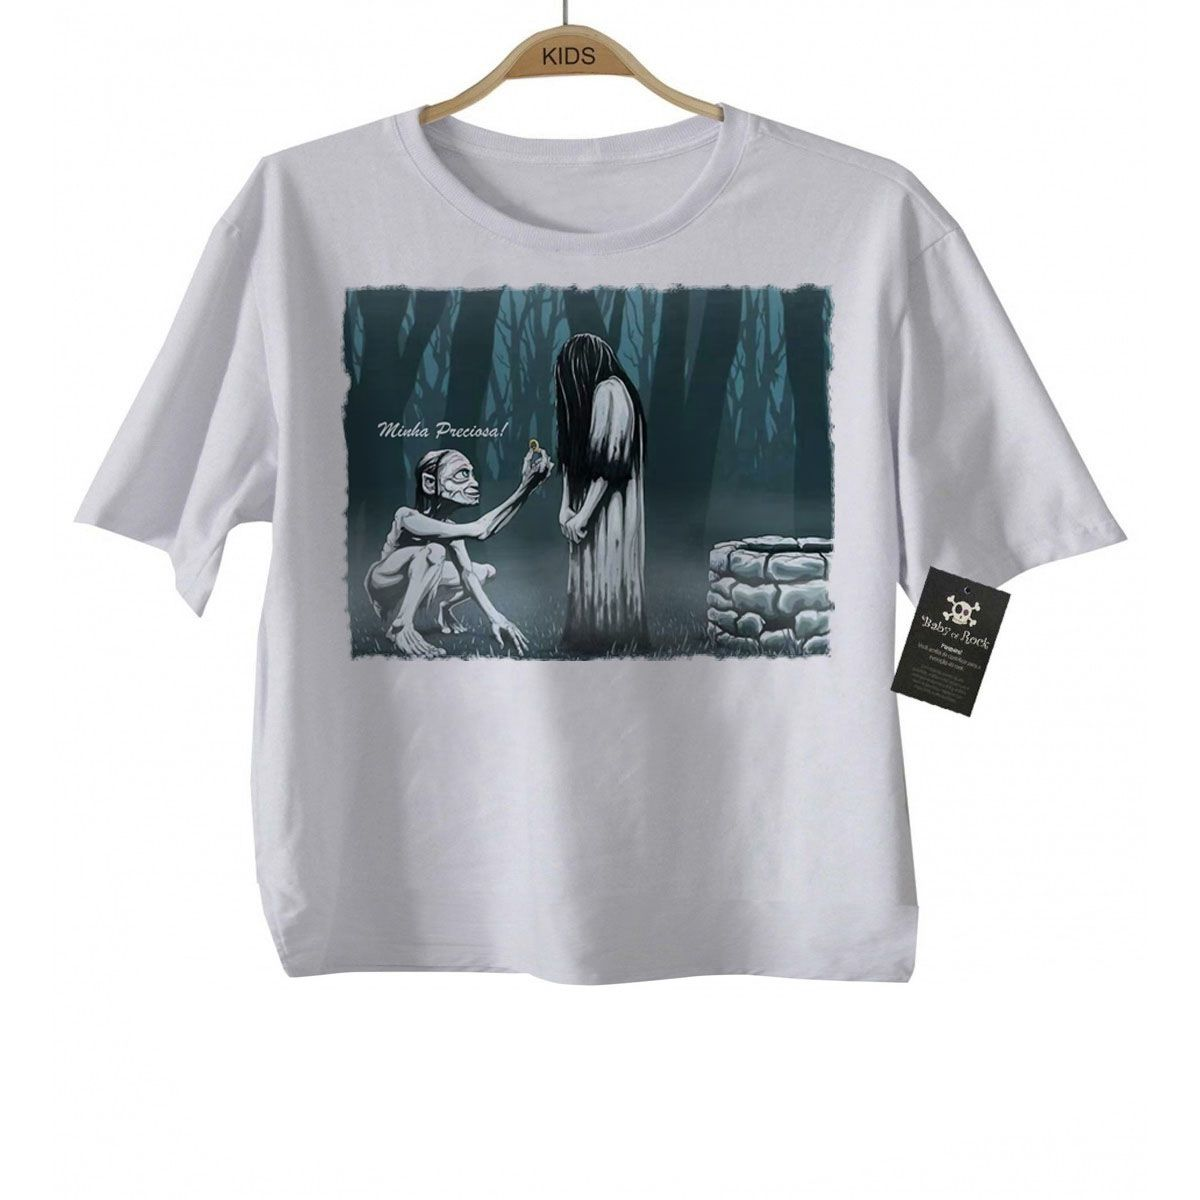 Camiseta  de Filmes o Chamado e o Sr. dos Aneis Terror Cute - White  - Baby Monster - Body Bebe